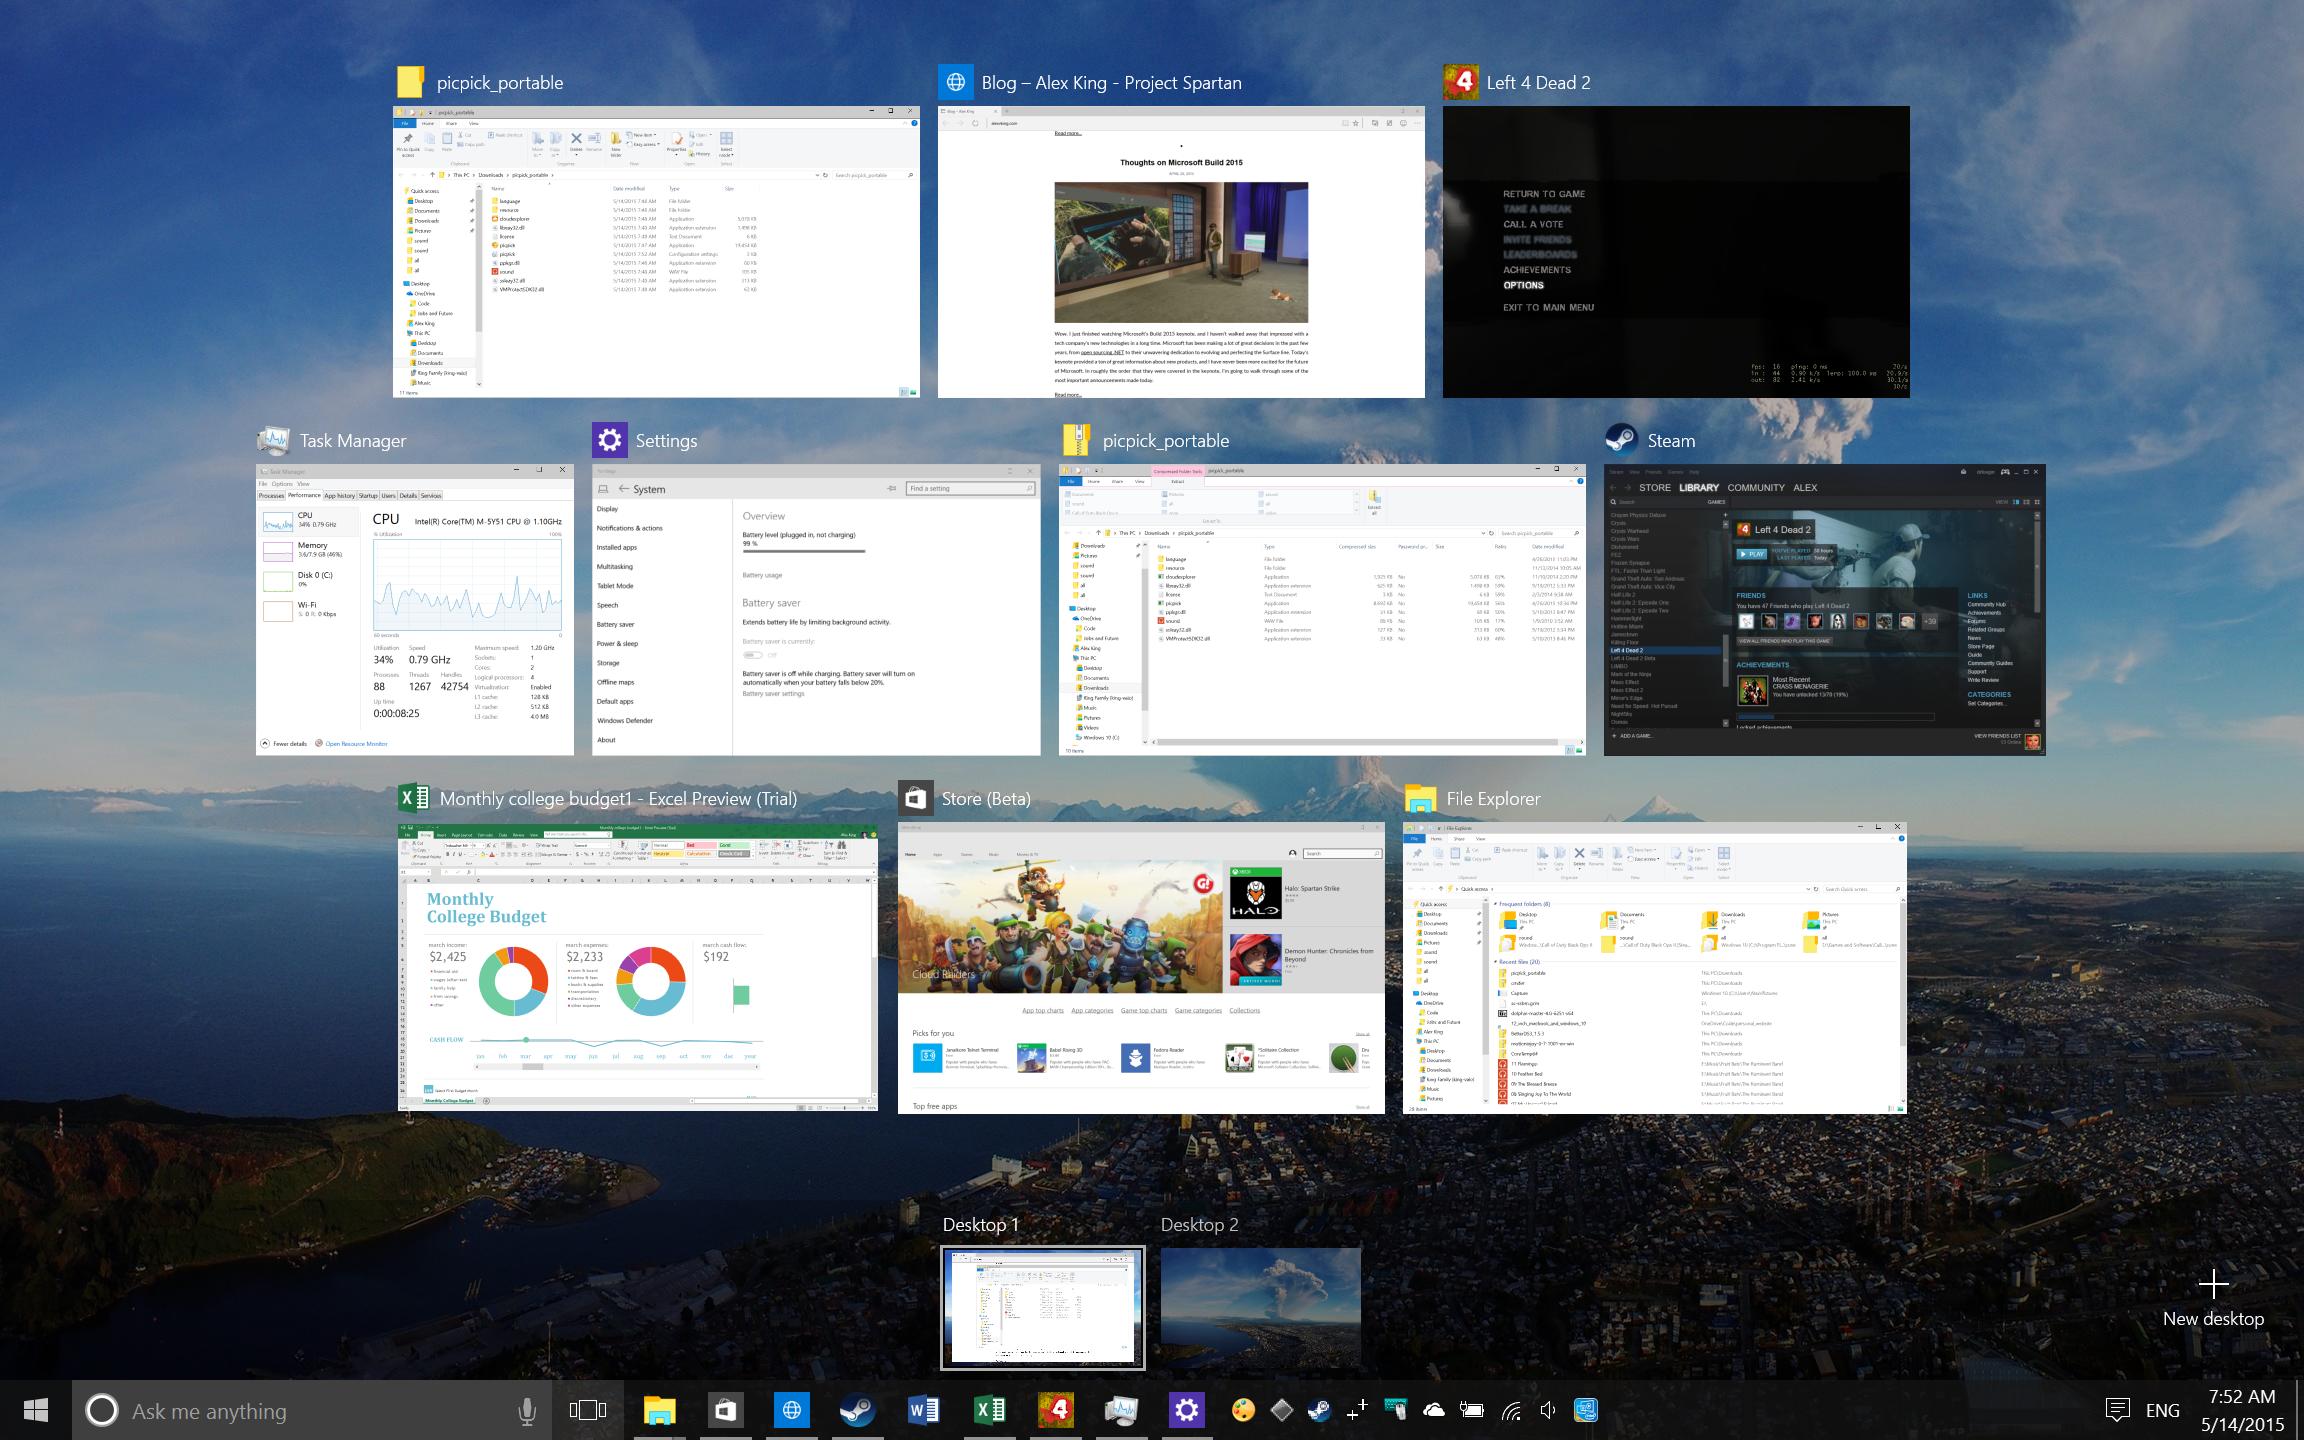 macbook emulator for windows 10